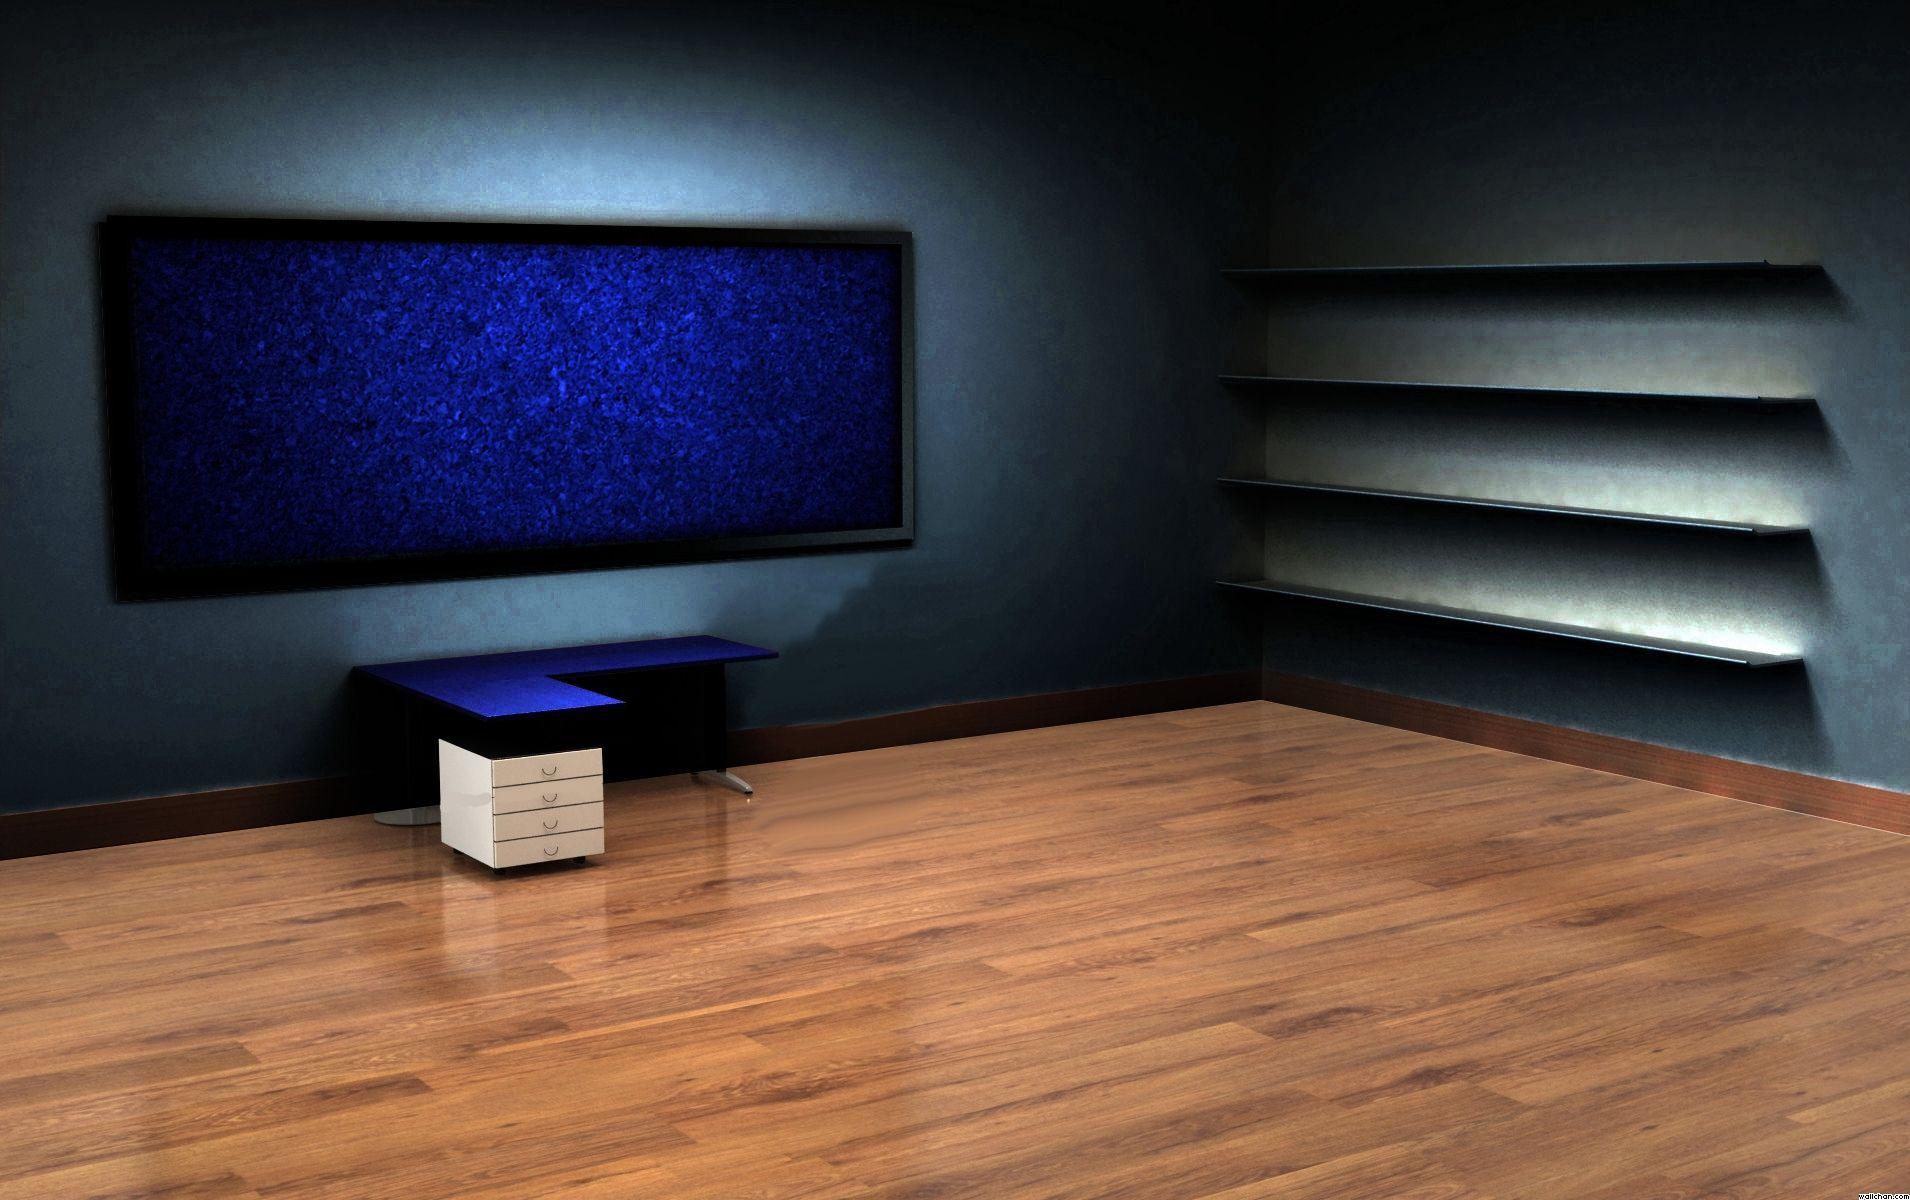 1910x1200 10 Top Desk And Shelves Desktop Background FULL